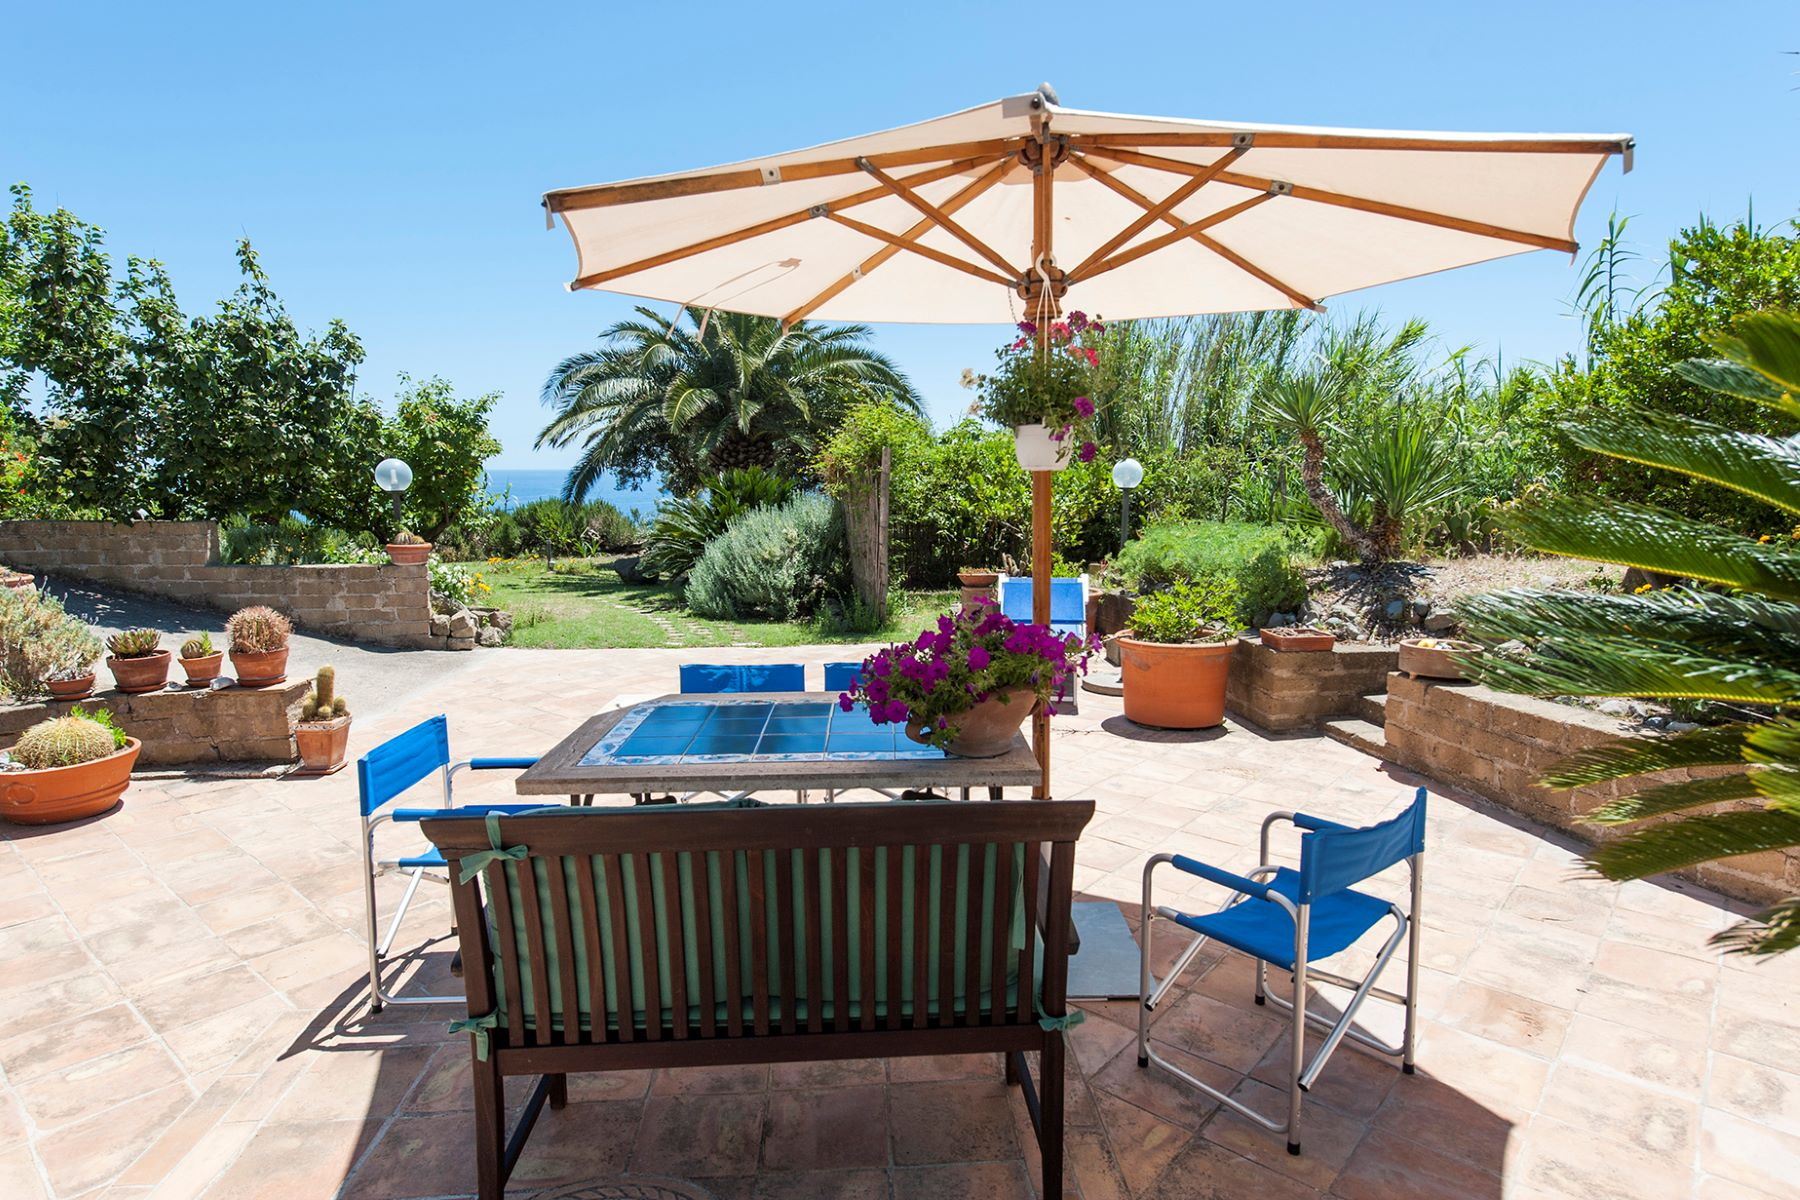 Single Family Home for Sale at Oasis of peace in the magic island of Ventotene Ventotene, Latina Italy